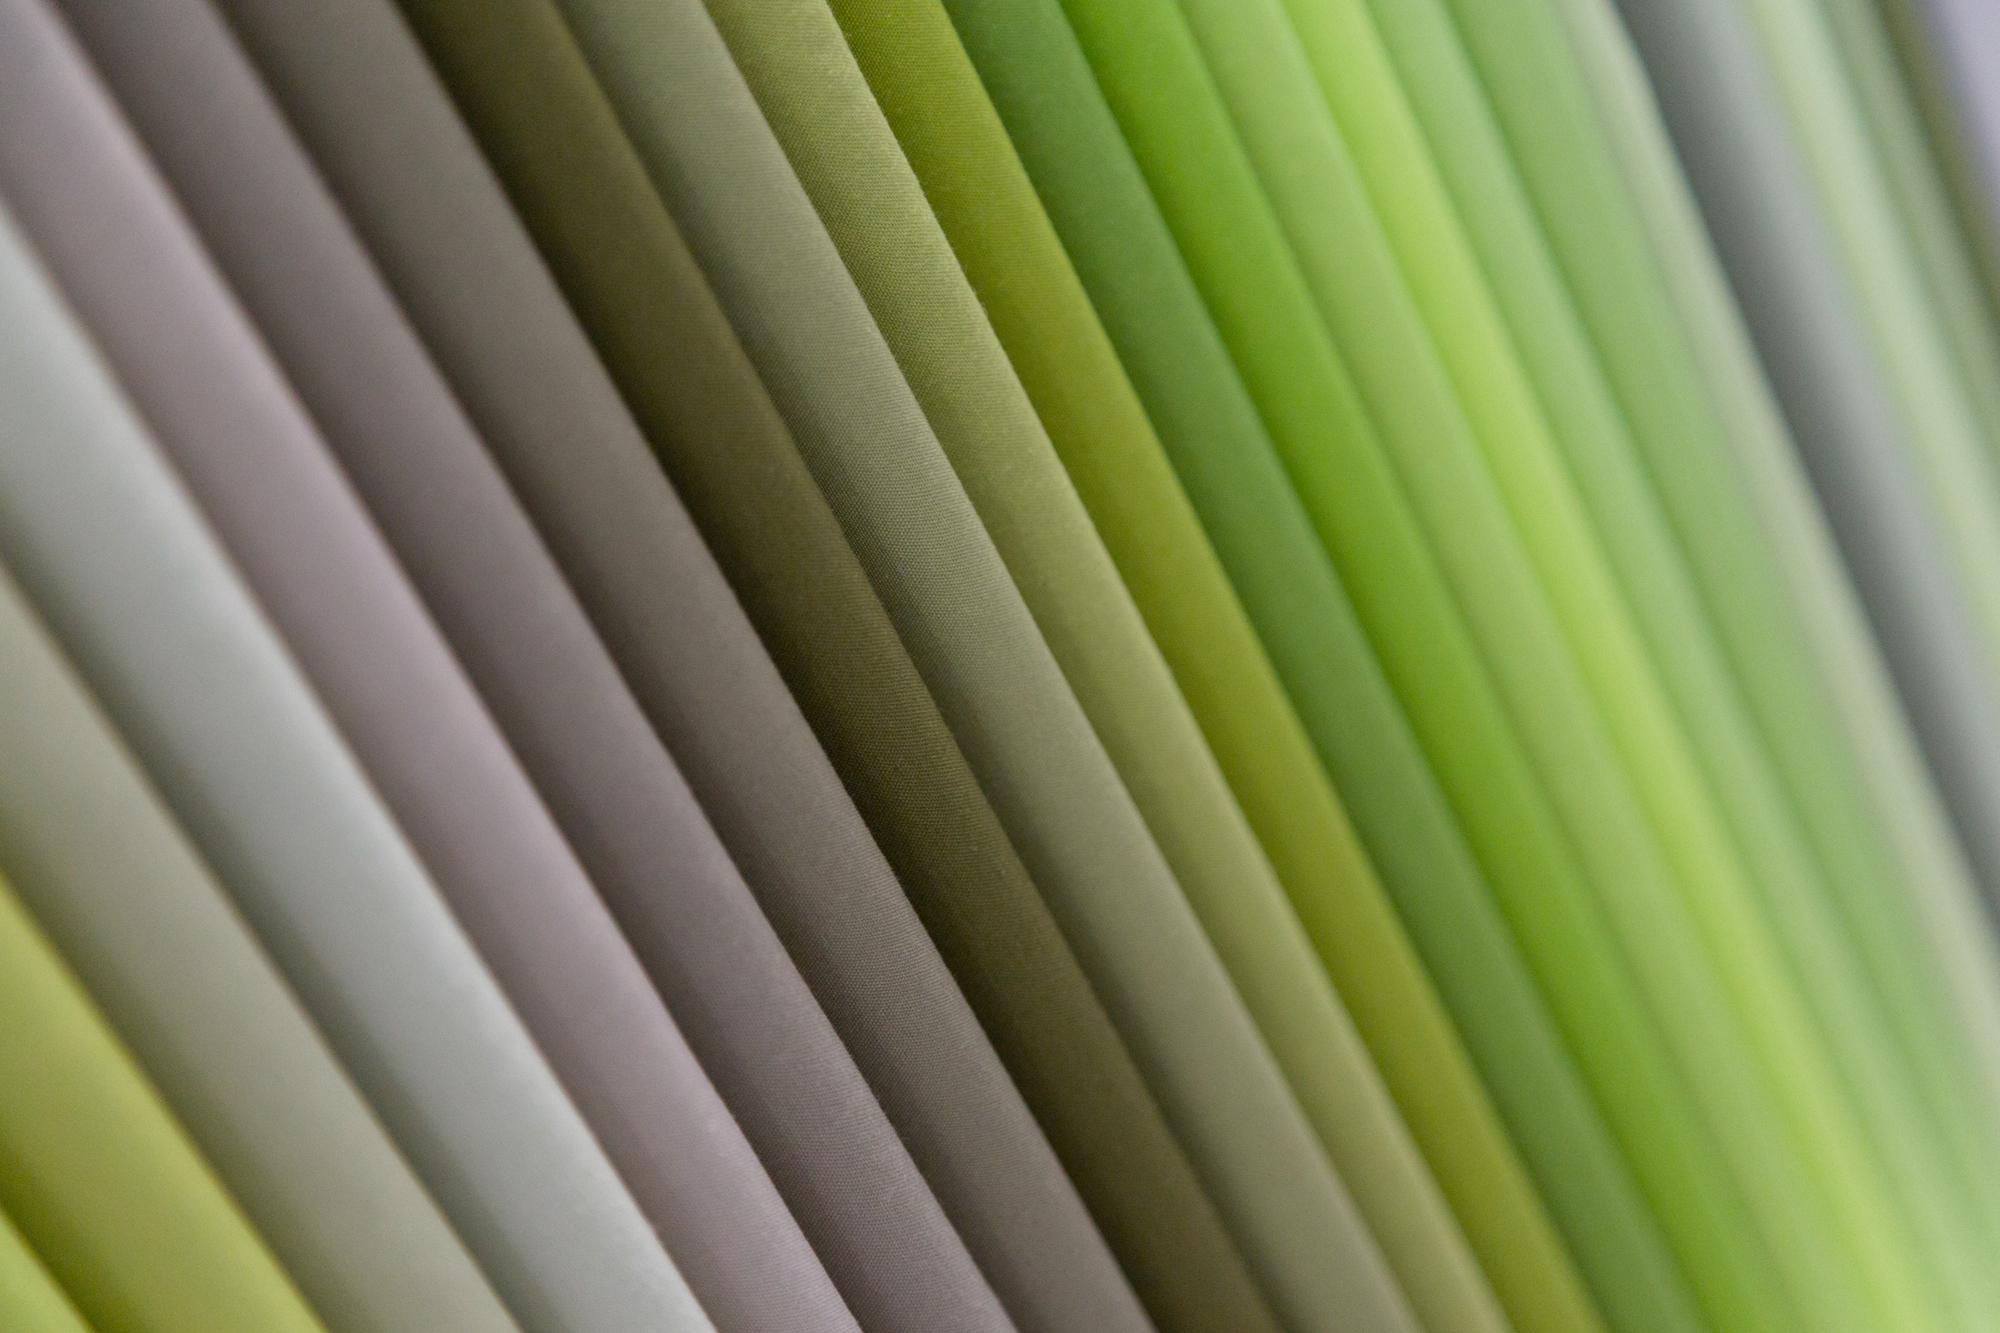 RK_QMfall17_Kona colors wall_04.jpg